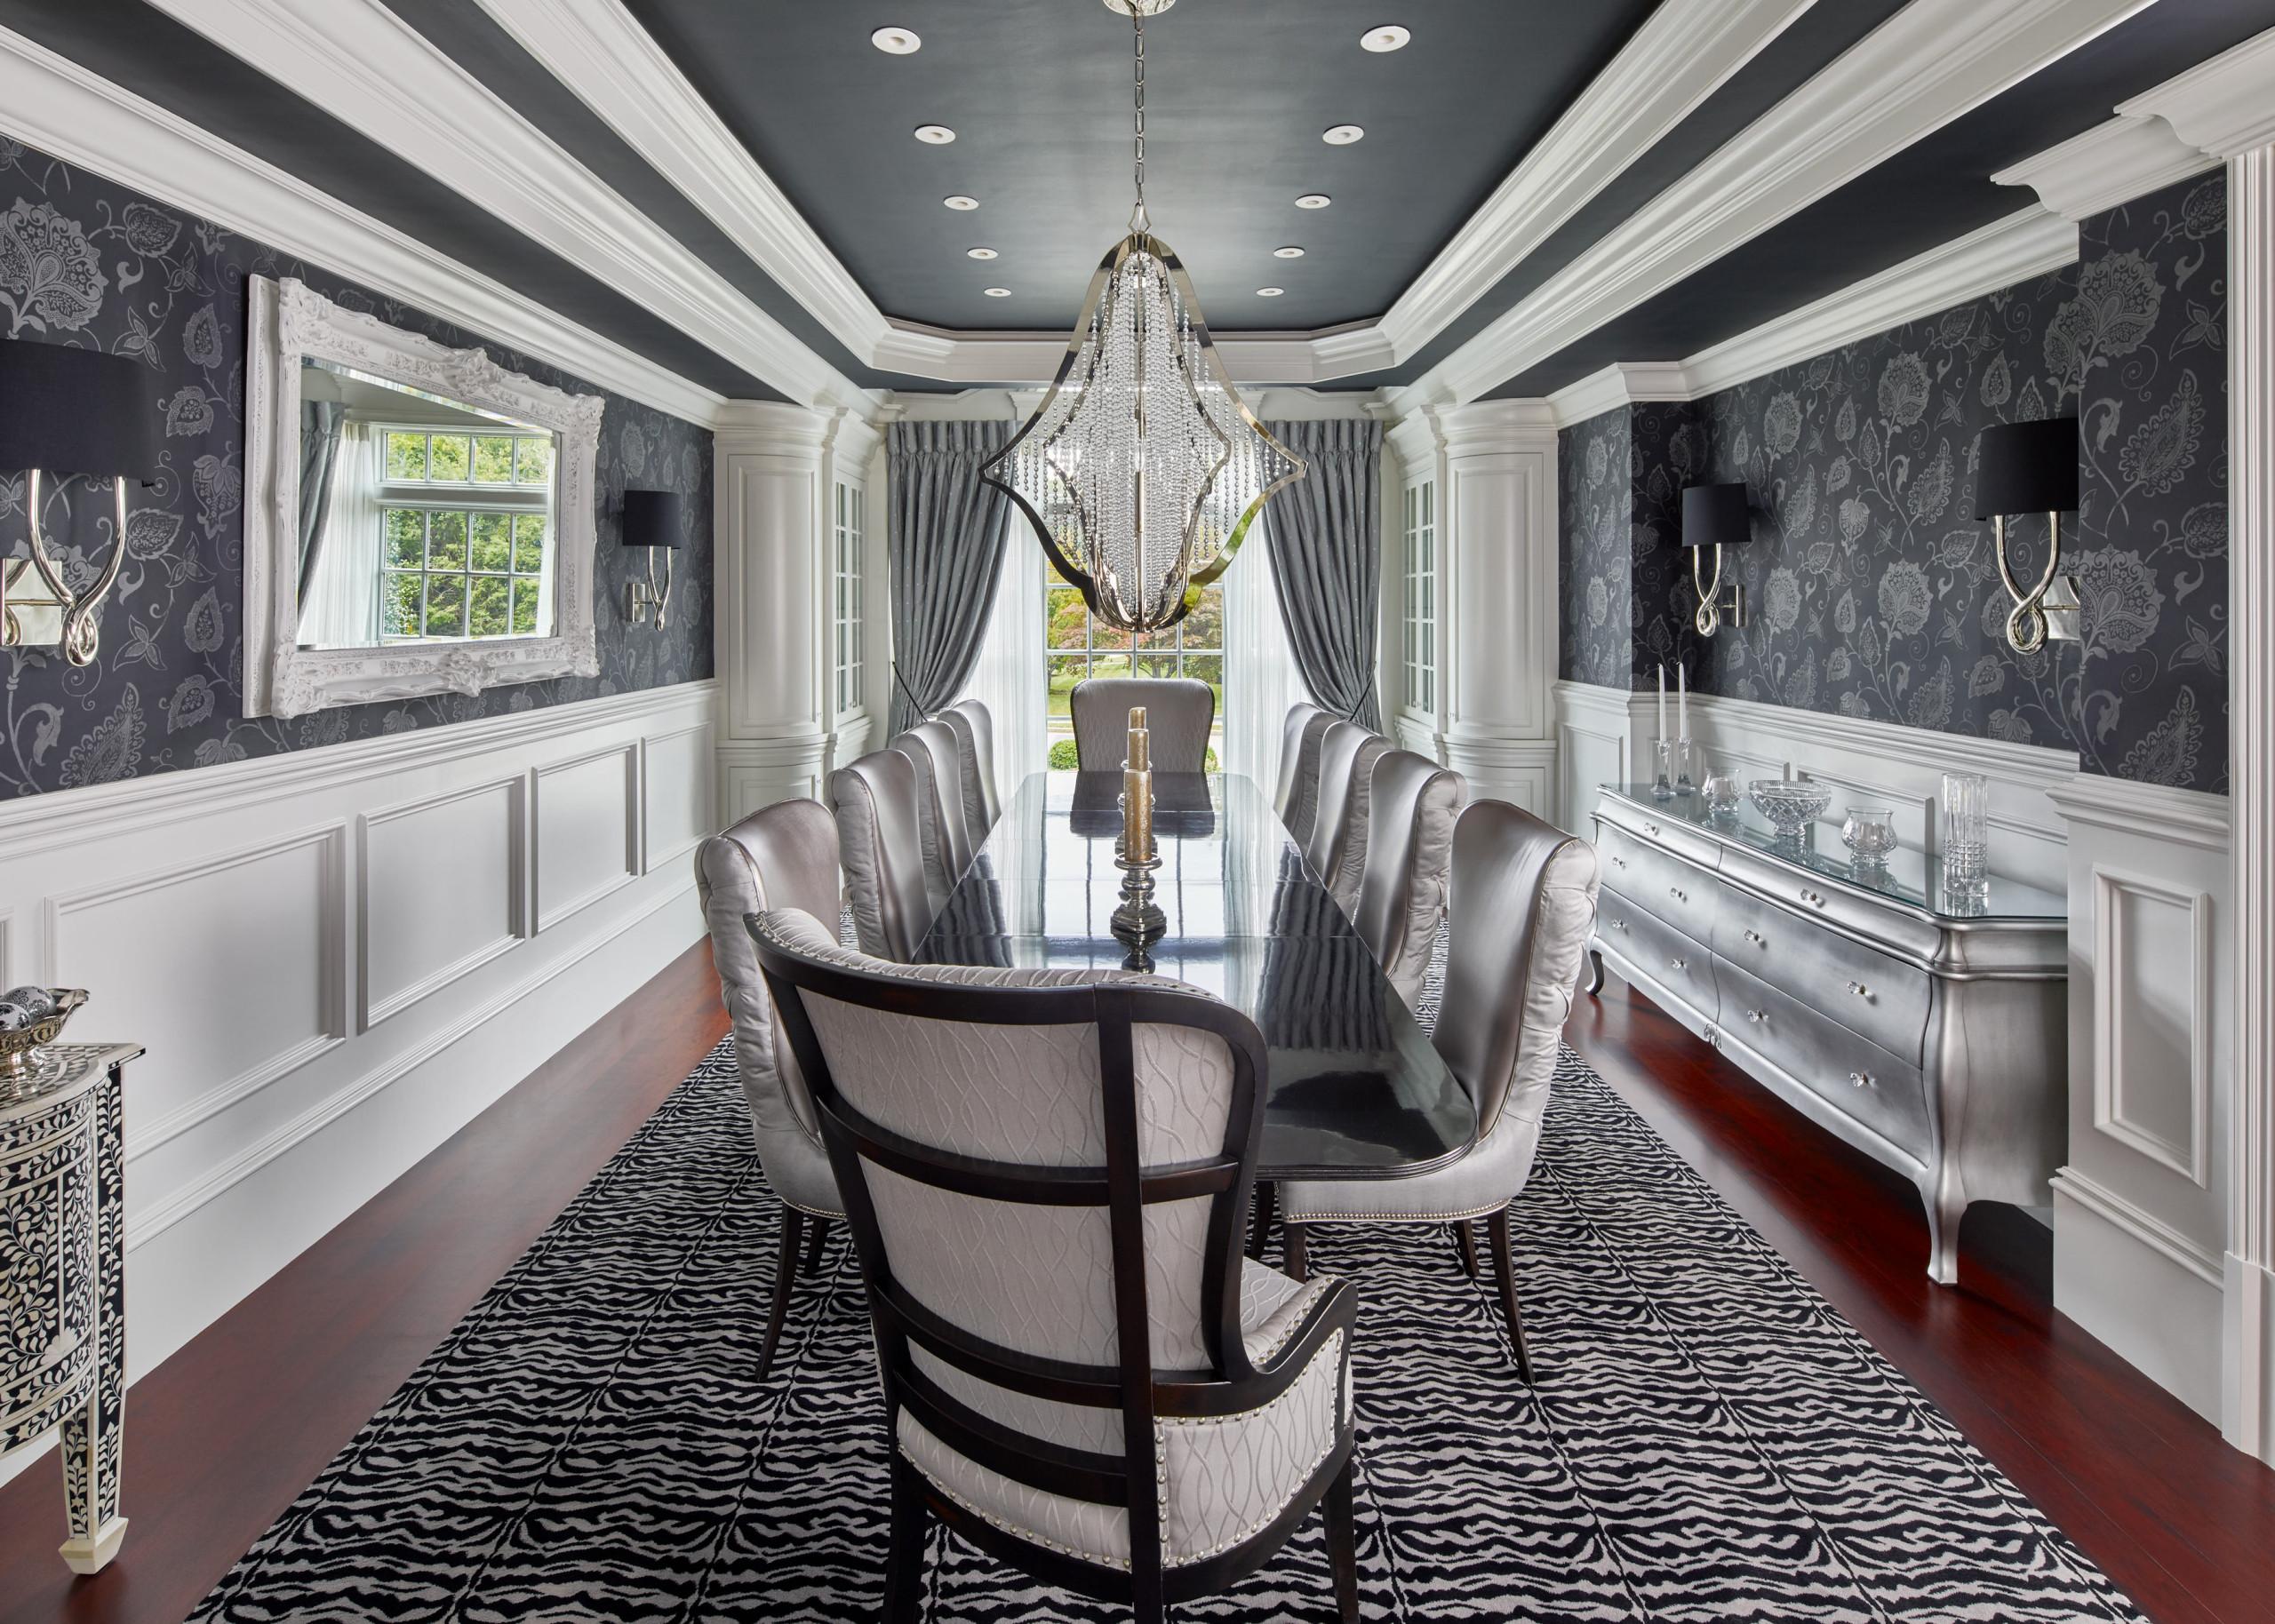 75 Beautiful Dark Wood Floor Dining Room Pictures Ideas February 2021 Houzz